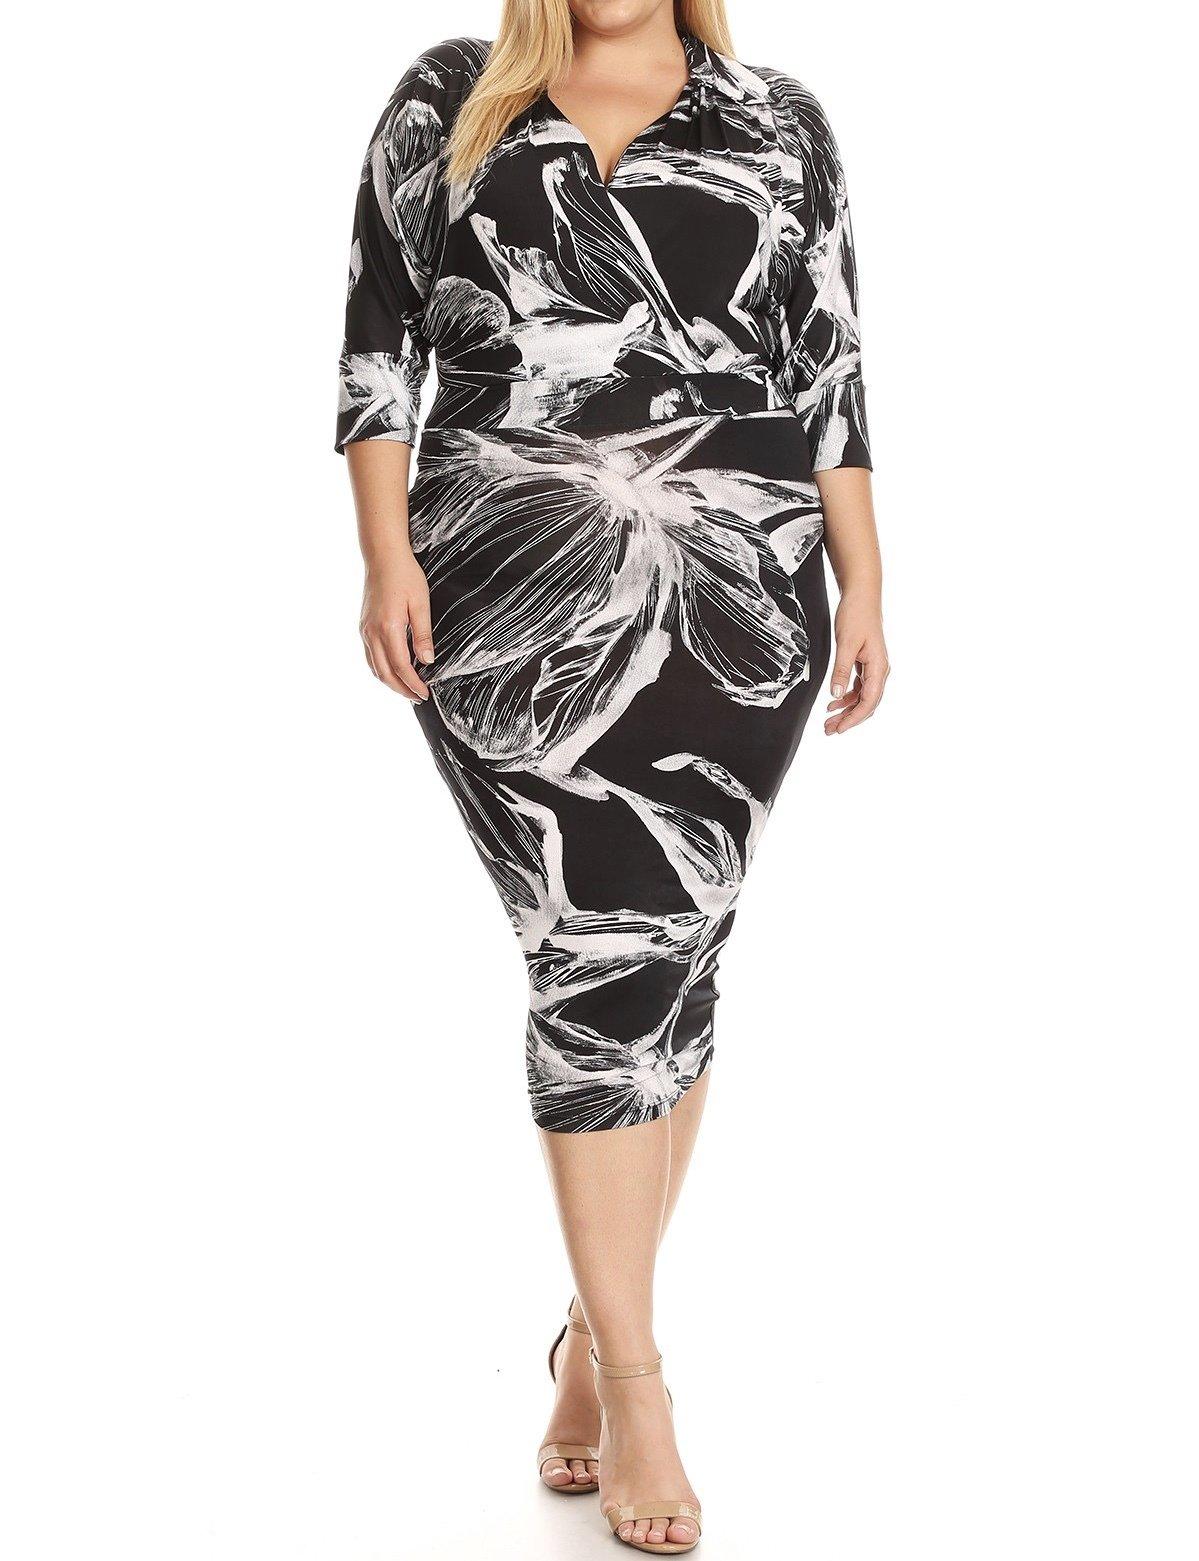 Iris Midi Dress Floral-Curvy UPDR515-IRISBLACKFLORAL